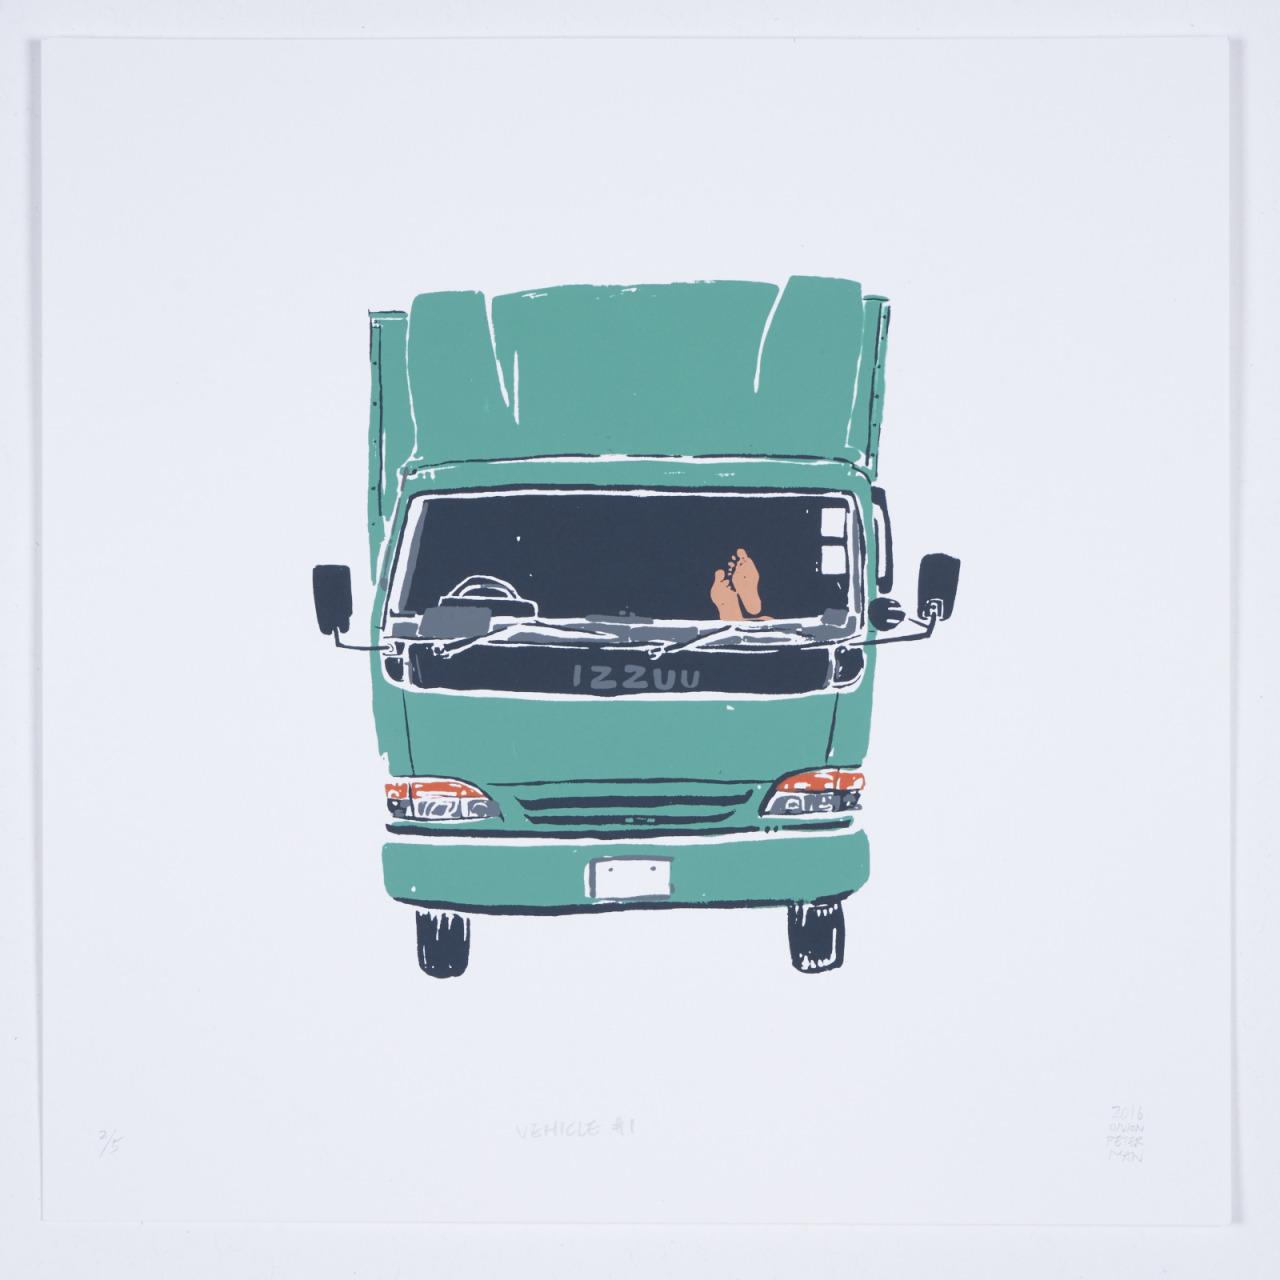 Vehicle #1